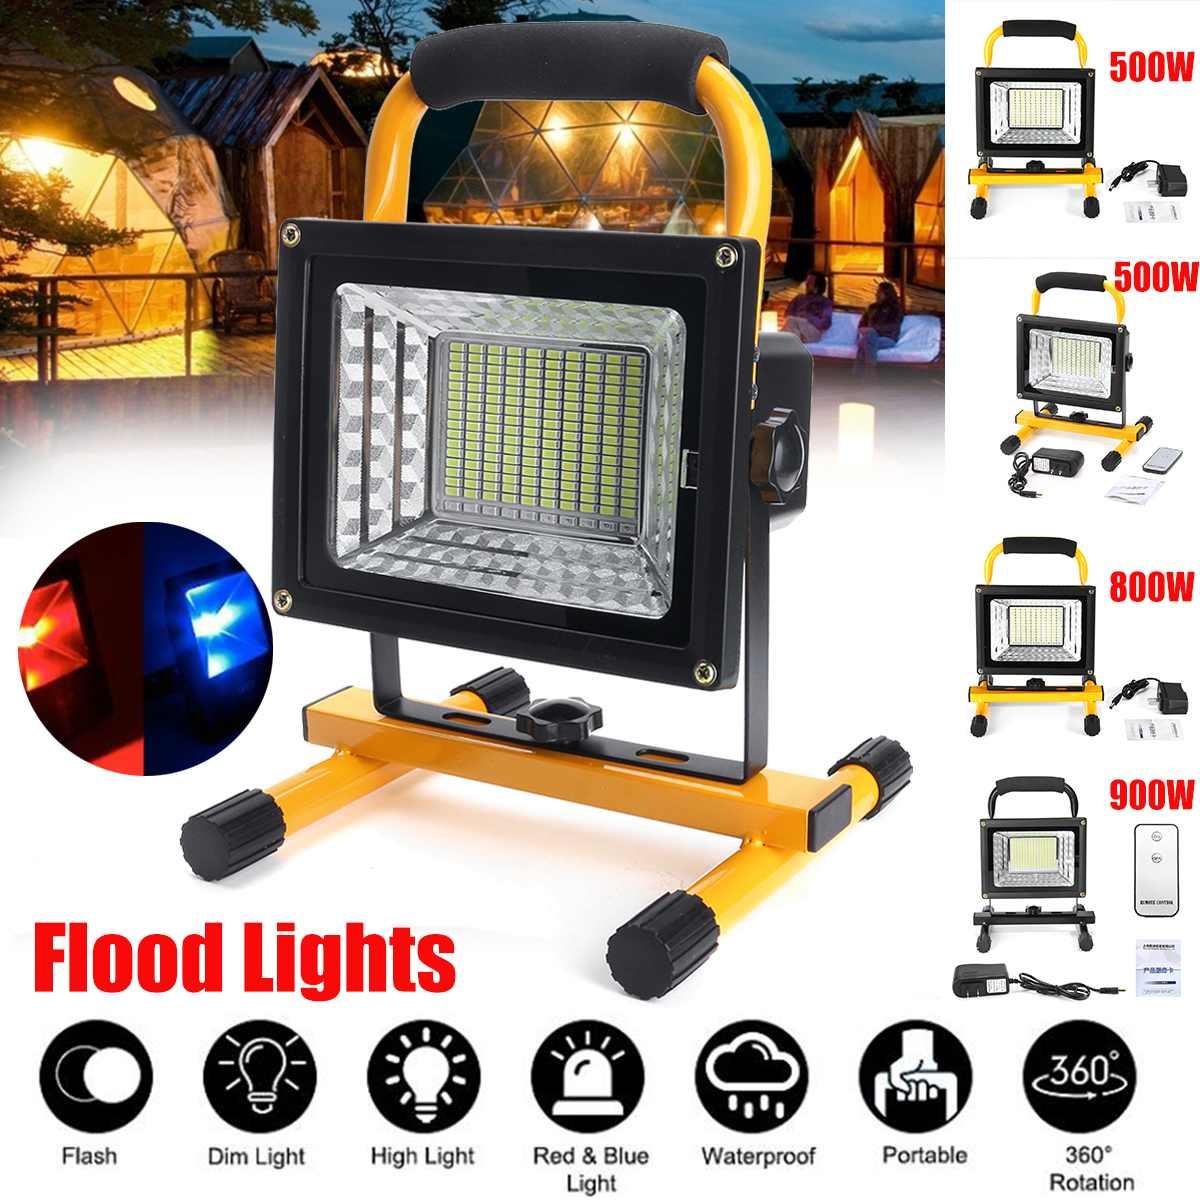 500/800/900W LED portátil recargable reflector a prueba de agua reflector con batería reflector Lámpara de trabajo al aire libre Camping